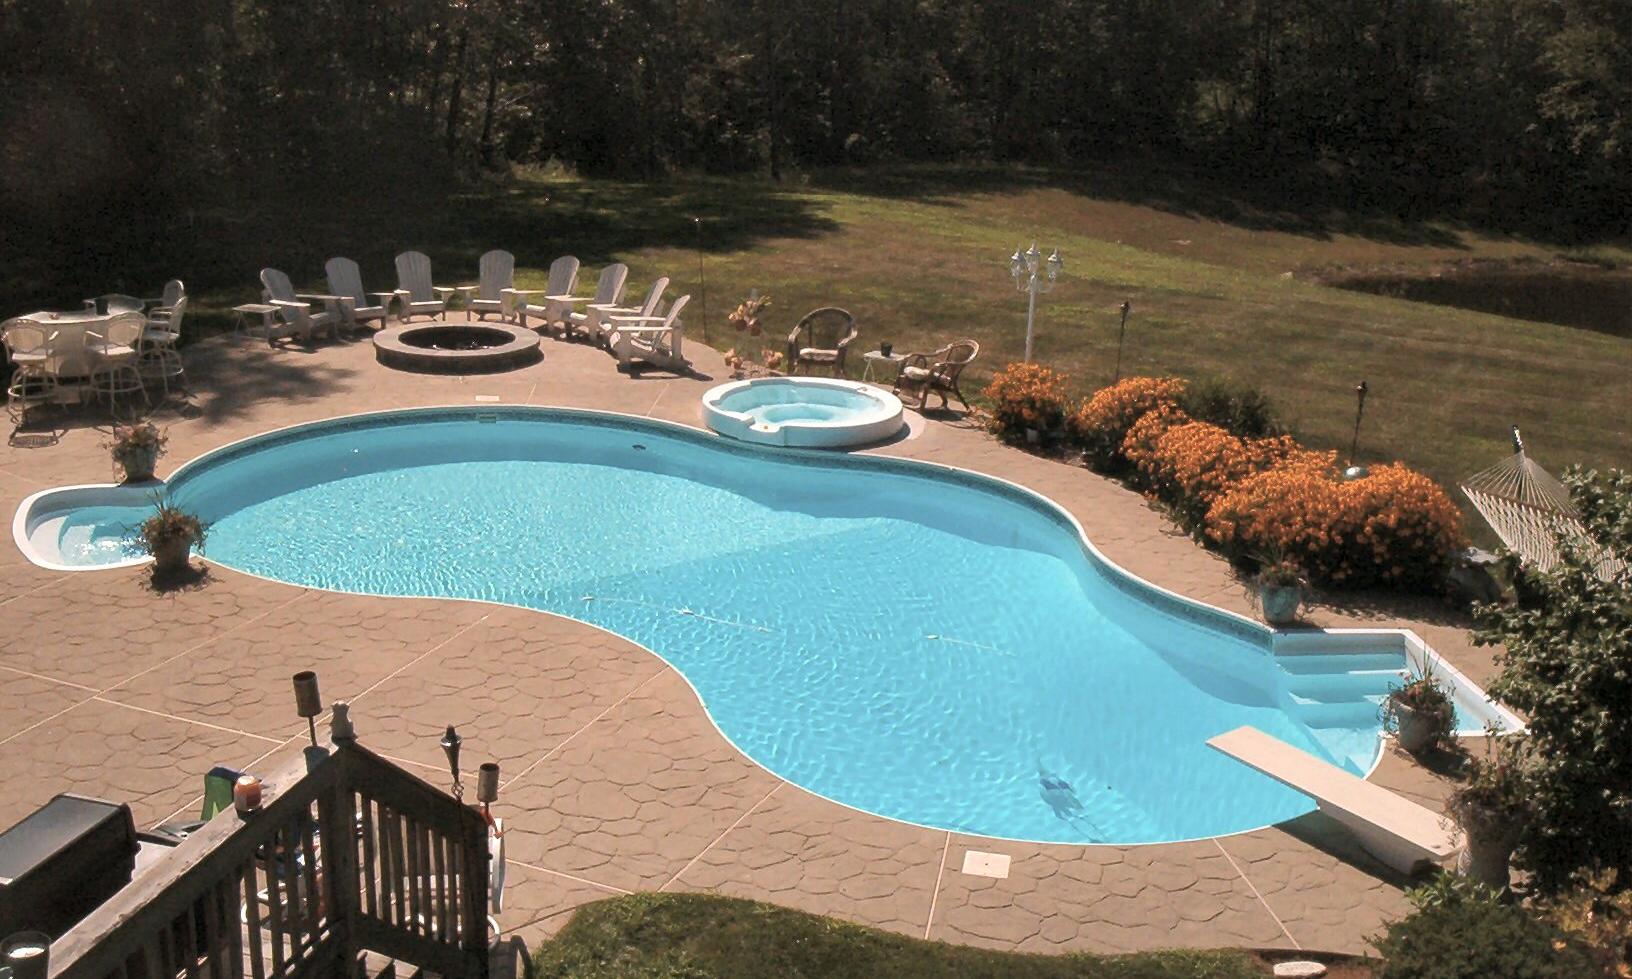 Ambler pool